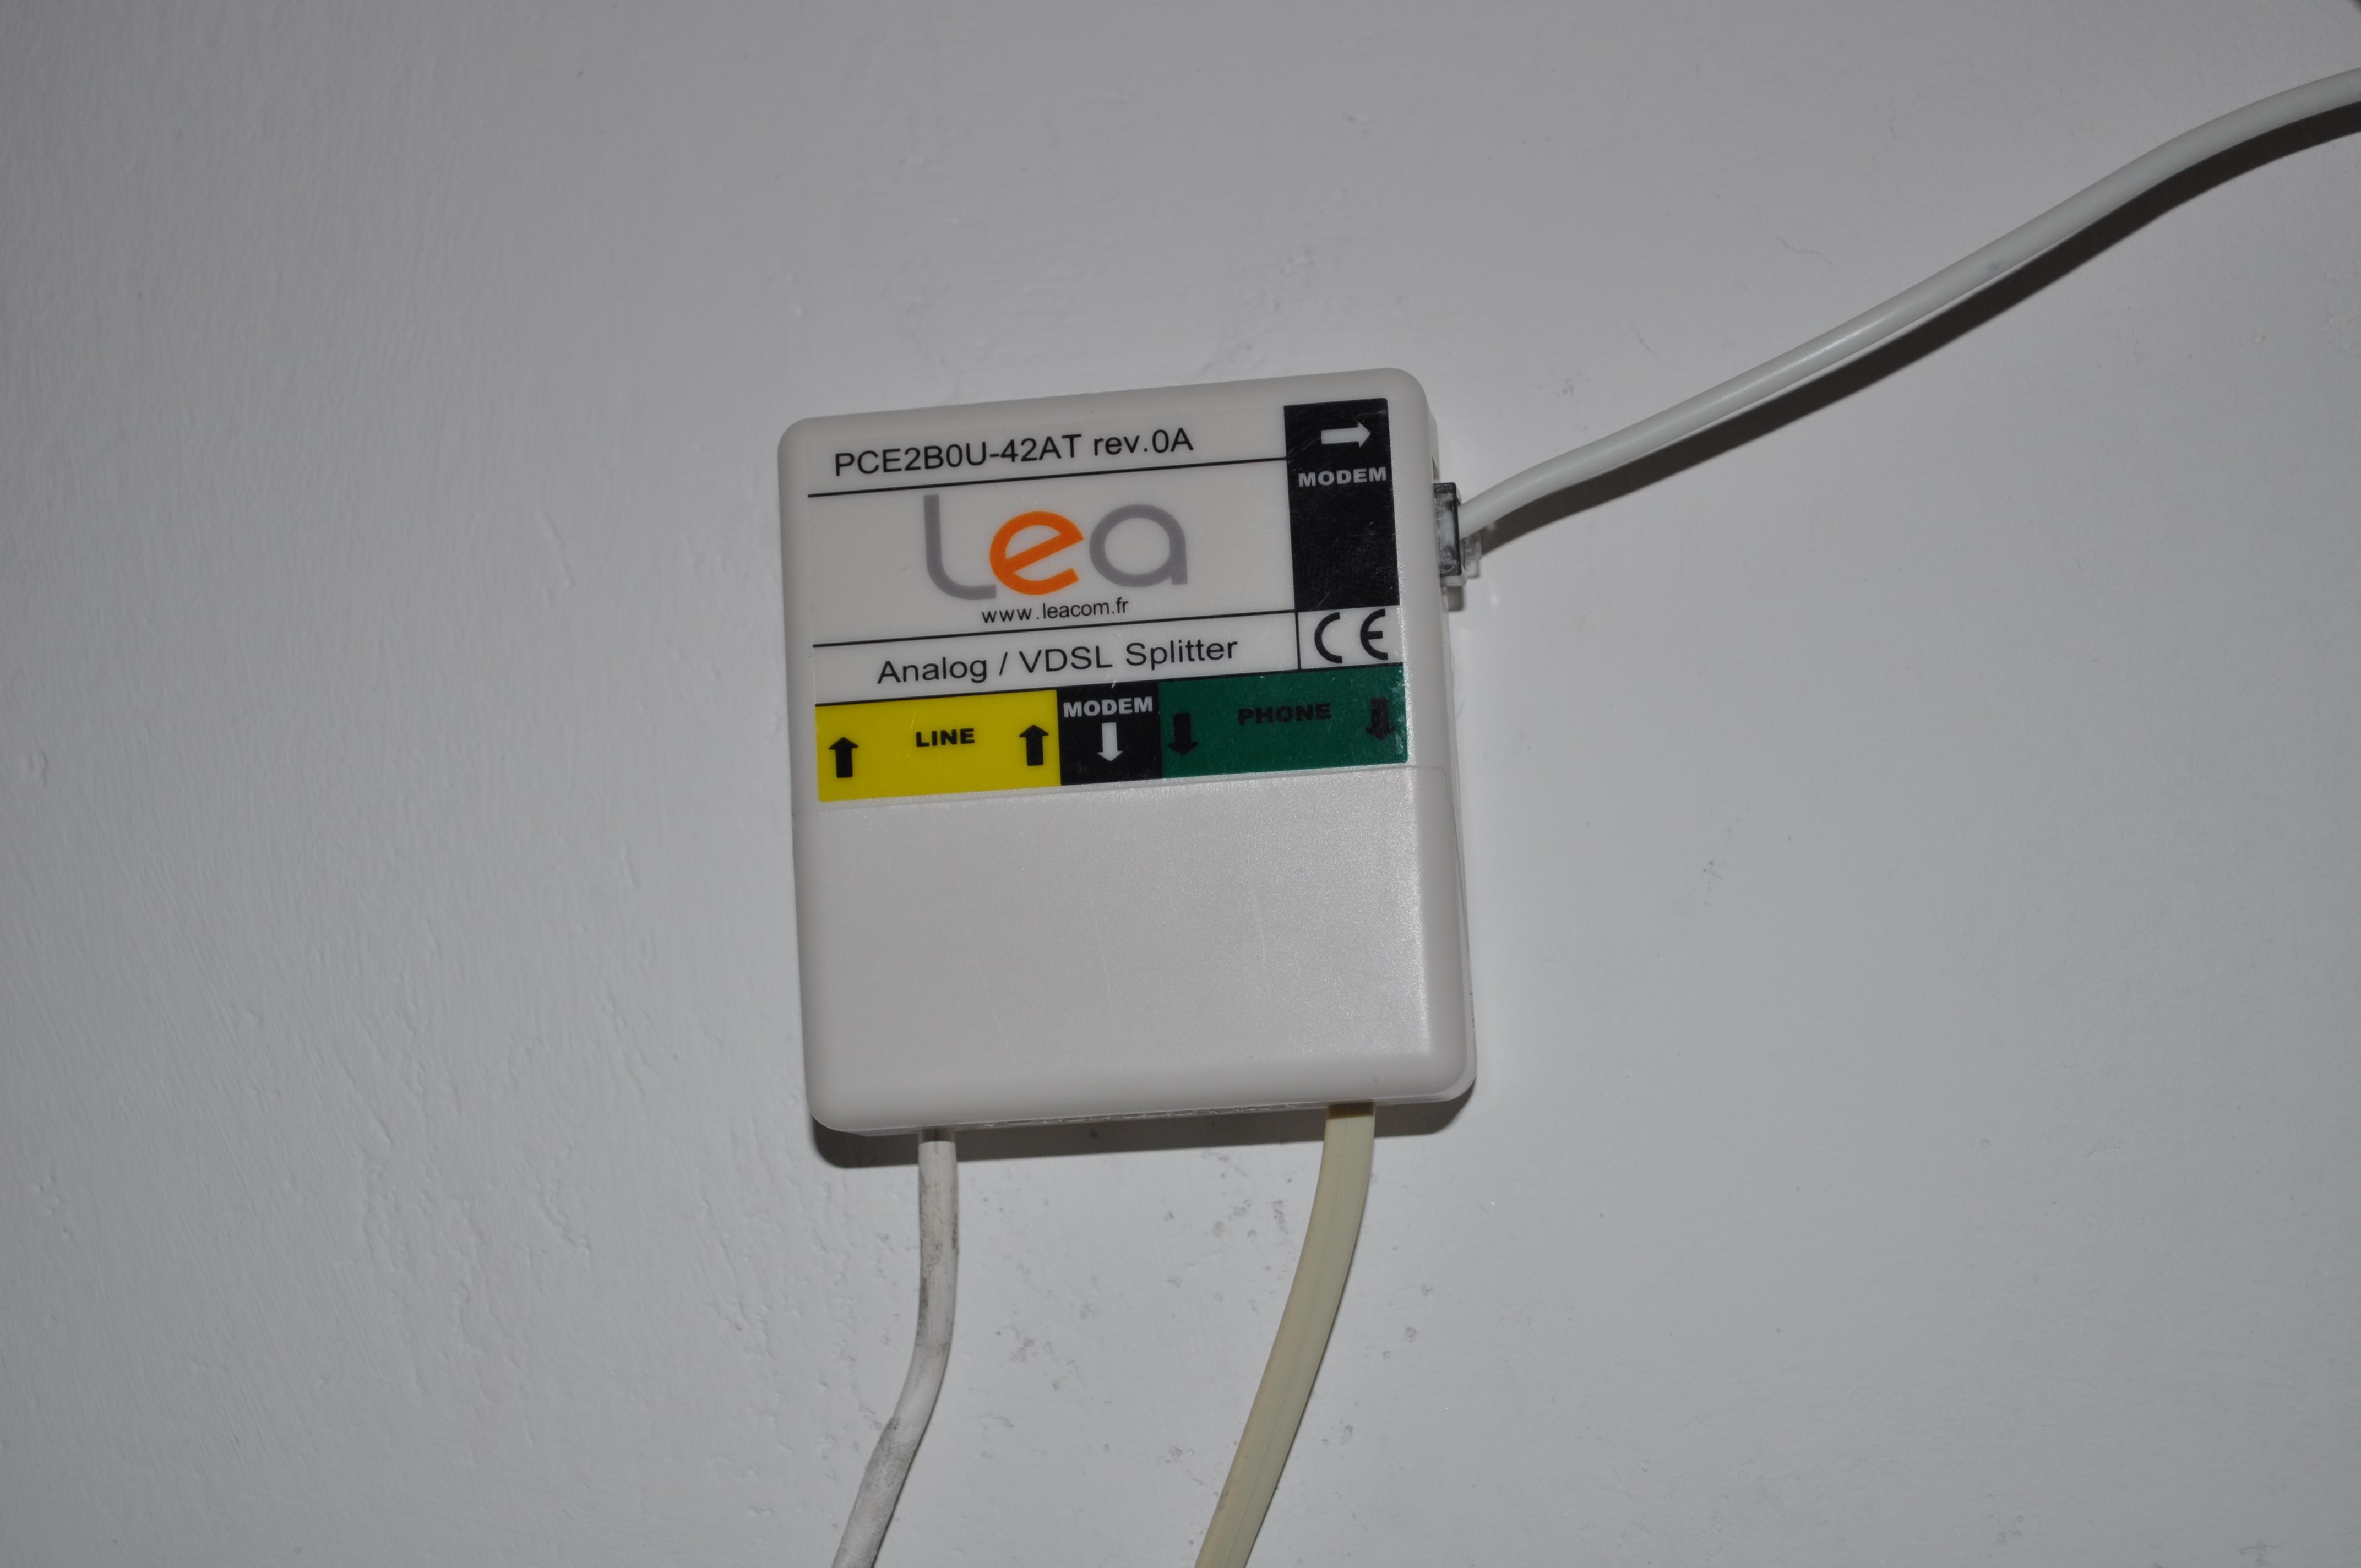 AVM FRITZ!Box Fon WLAN 7360 - Brak po��czenia z internetem VDSL Neostrada Fiber